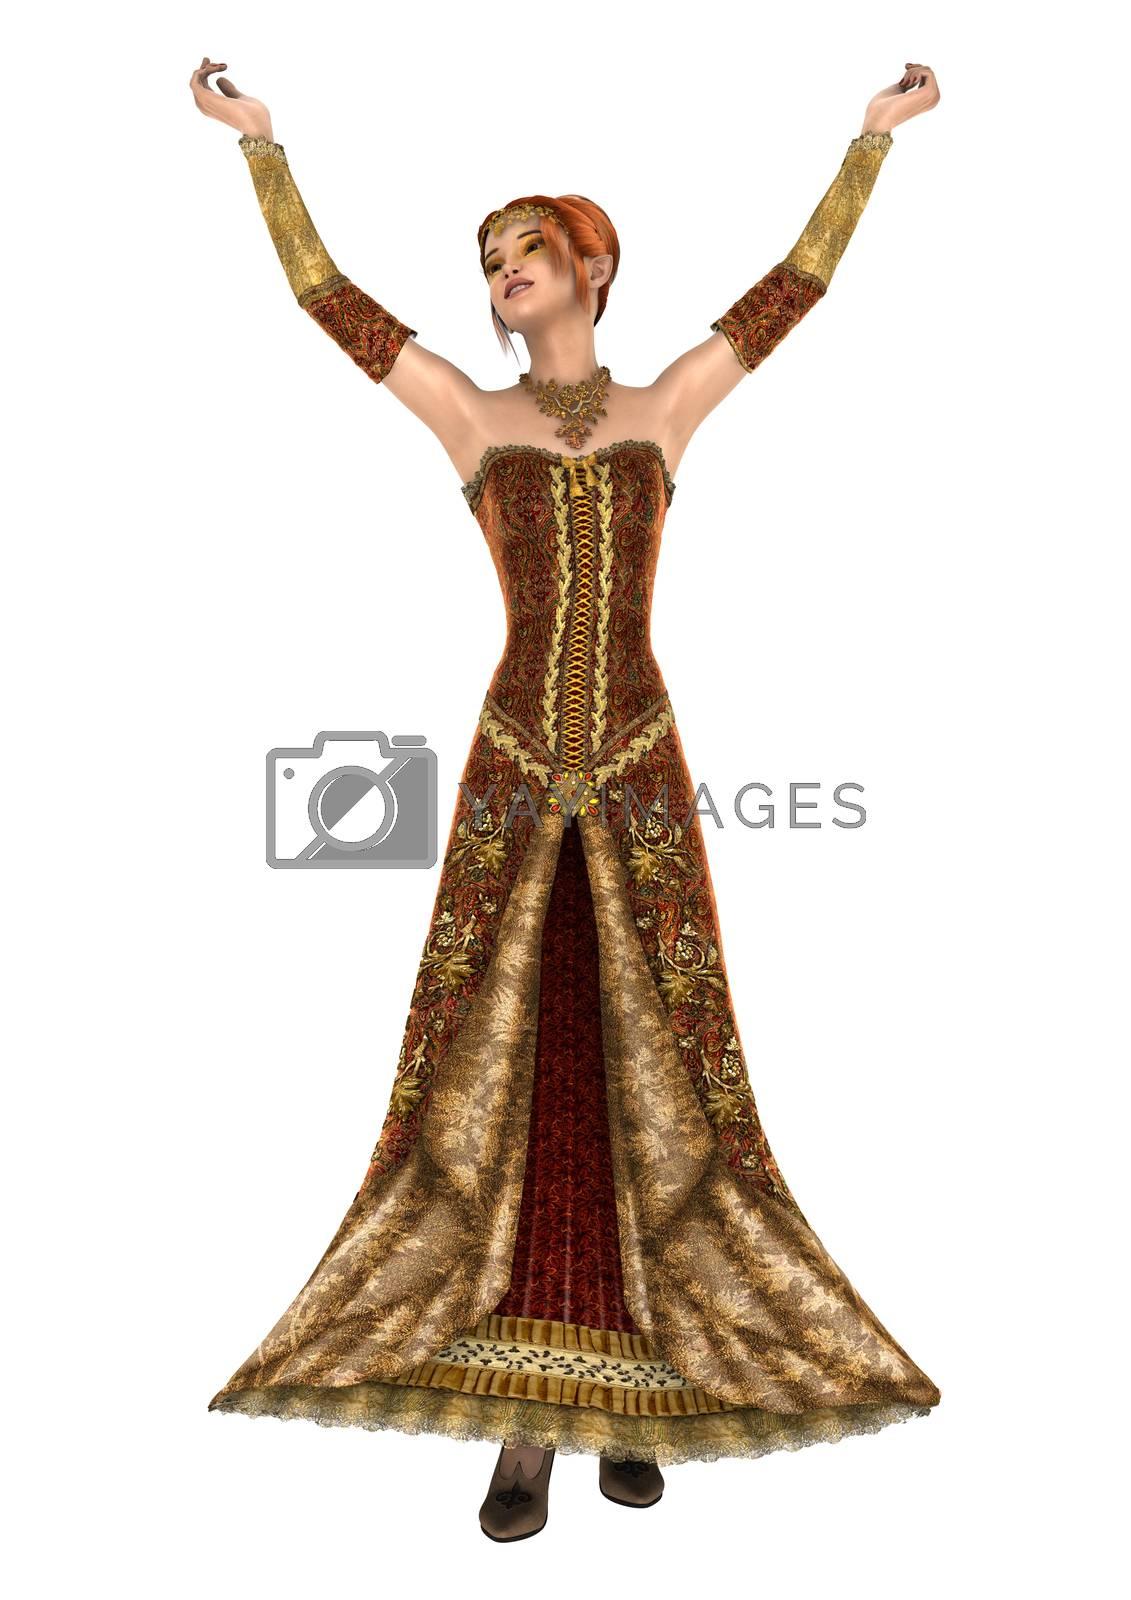 Princess of Autumn by Vac